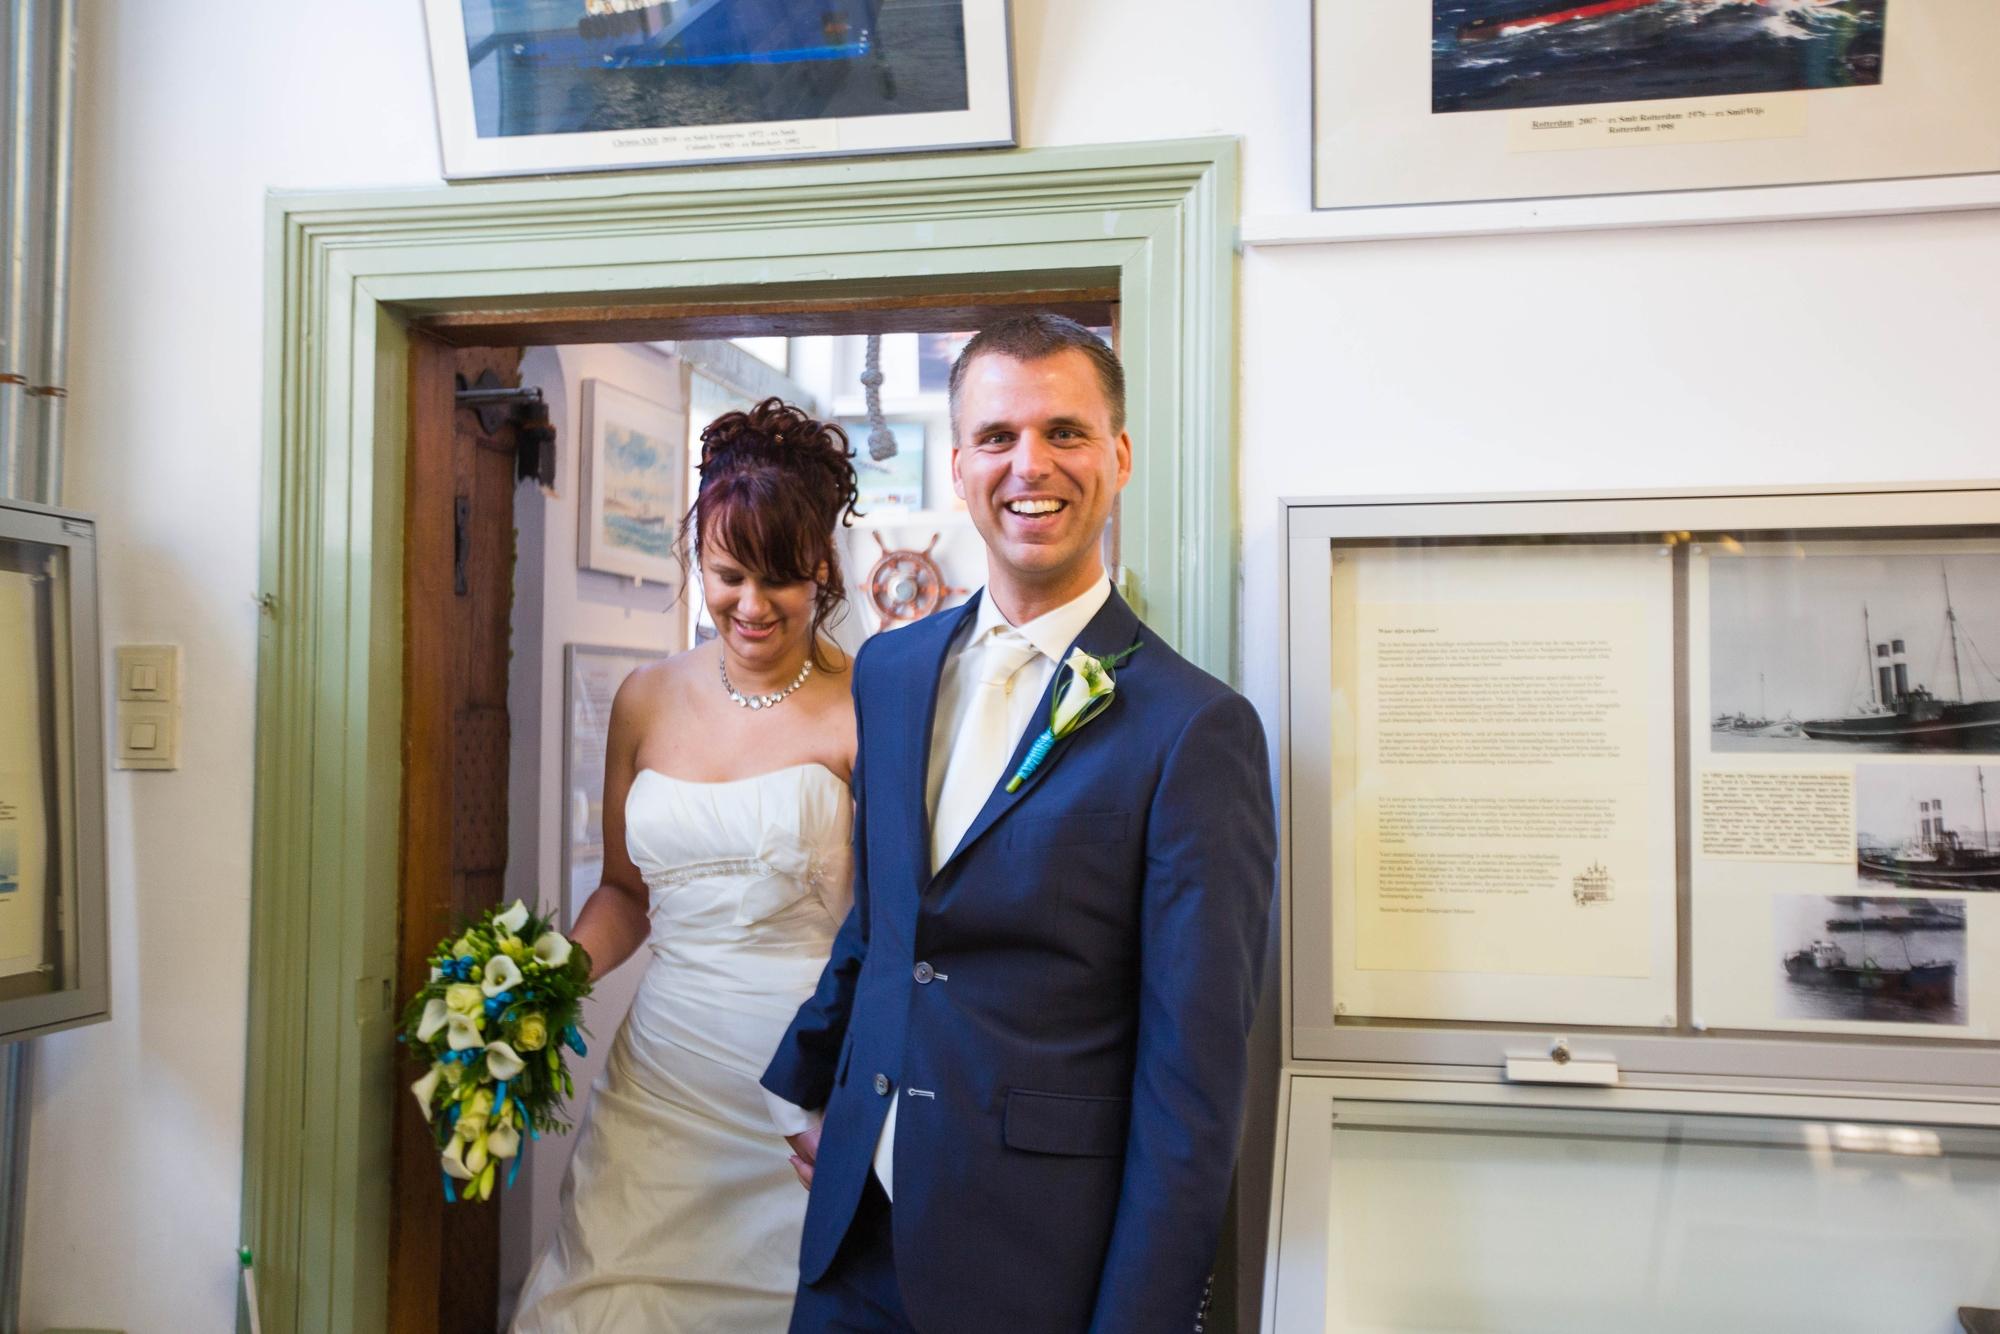 bruidsfotografie-trouwreportage-huwelijksfotografie-bruidsfotograaf-feestfotografie-Hans en Anne-100.jpg